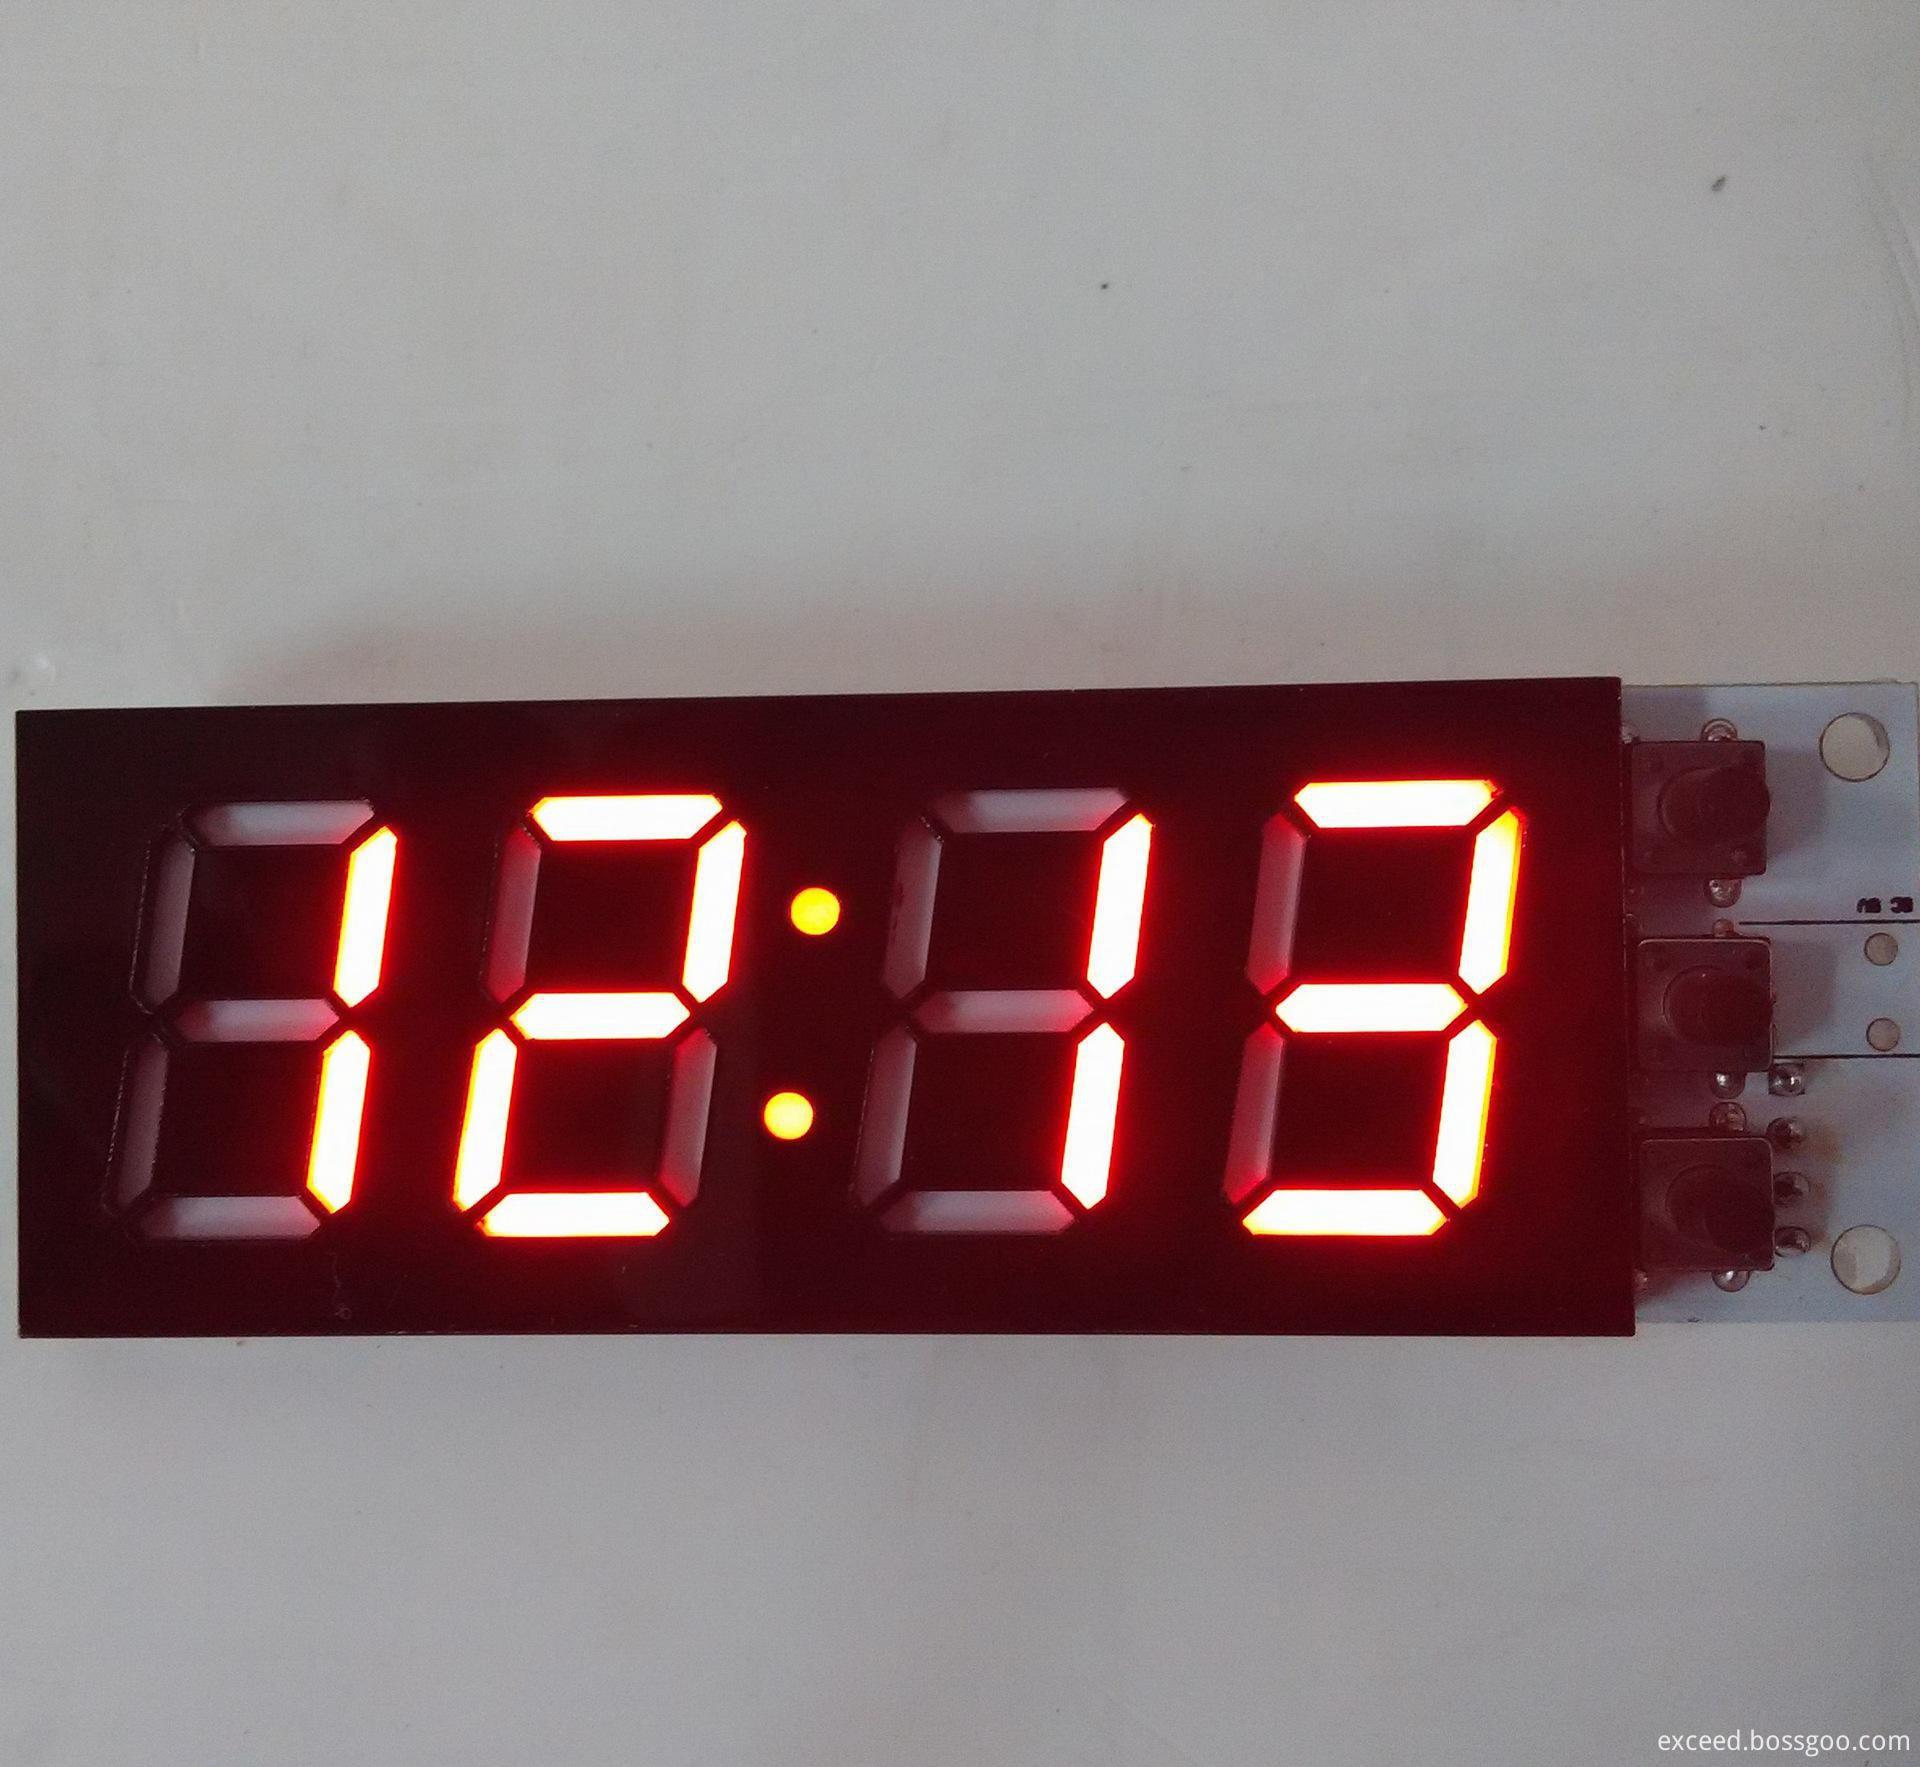 LED Digit Display